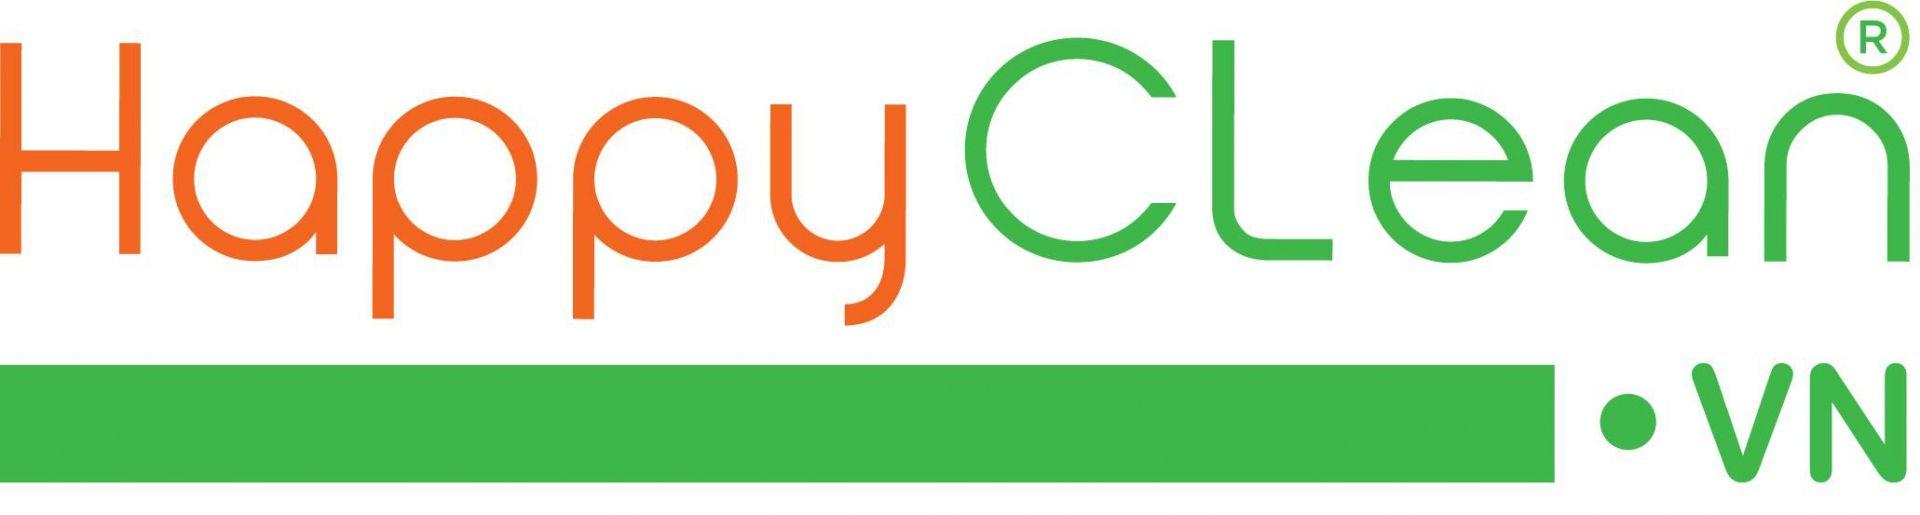 https://happyclean.vn/image/cache/catalog/logo/logo-happy-clean-0x0.jpg